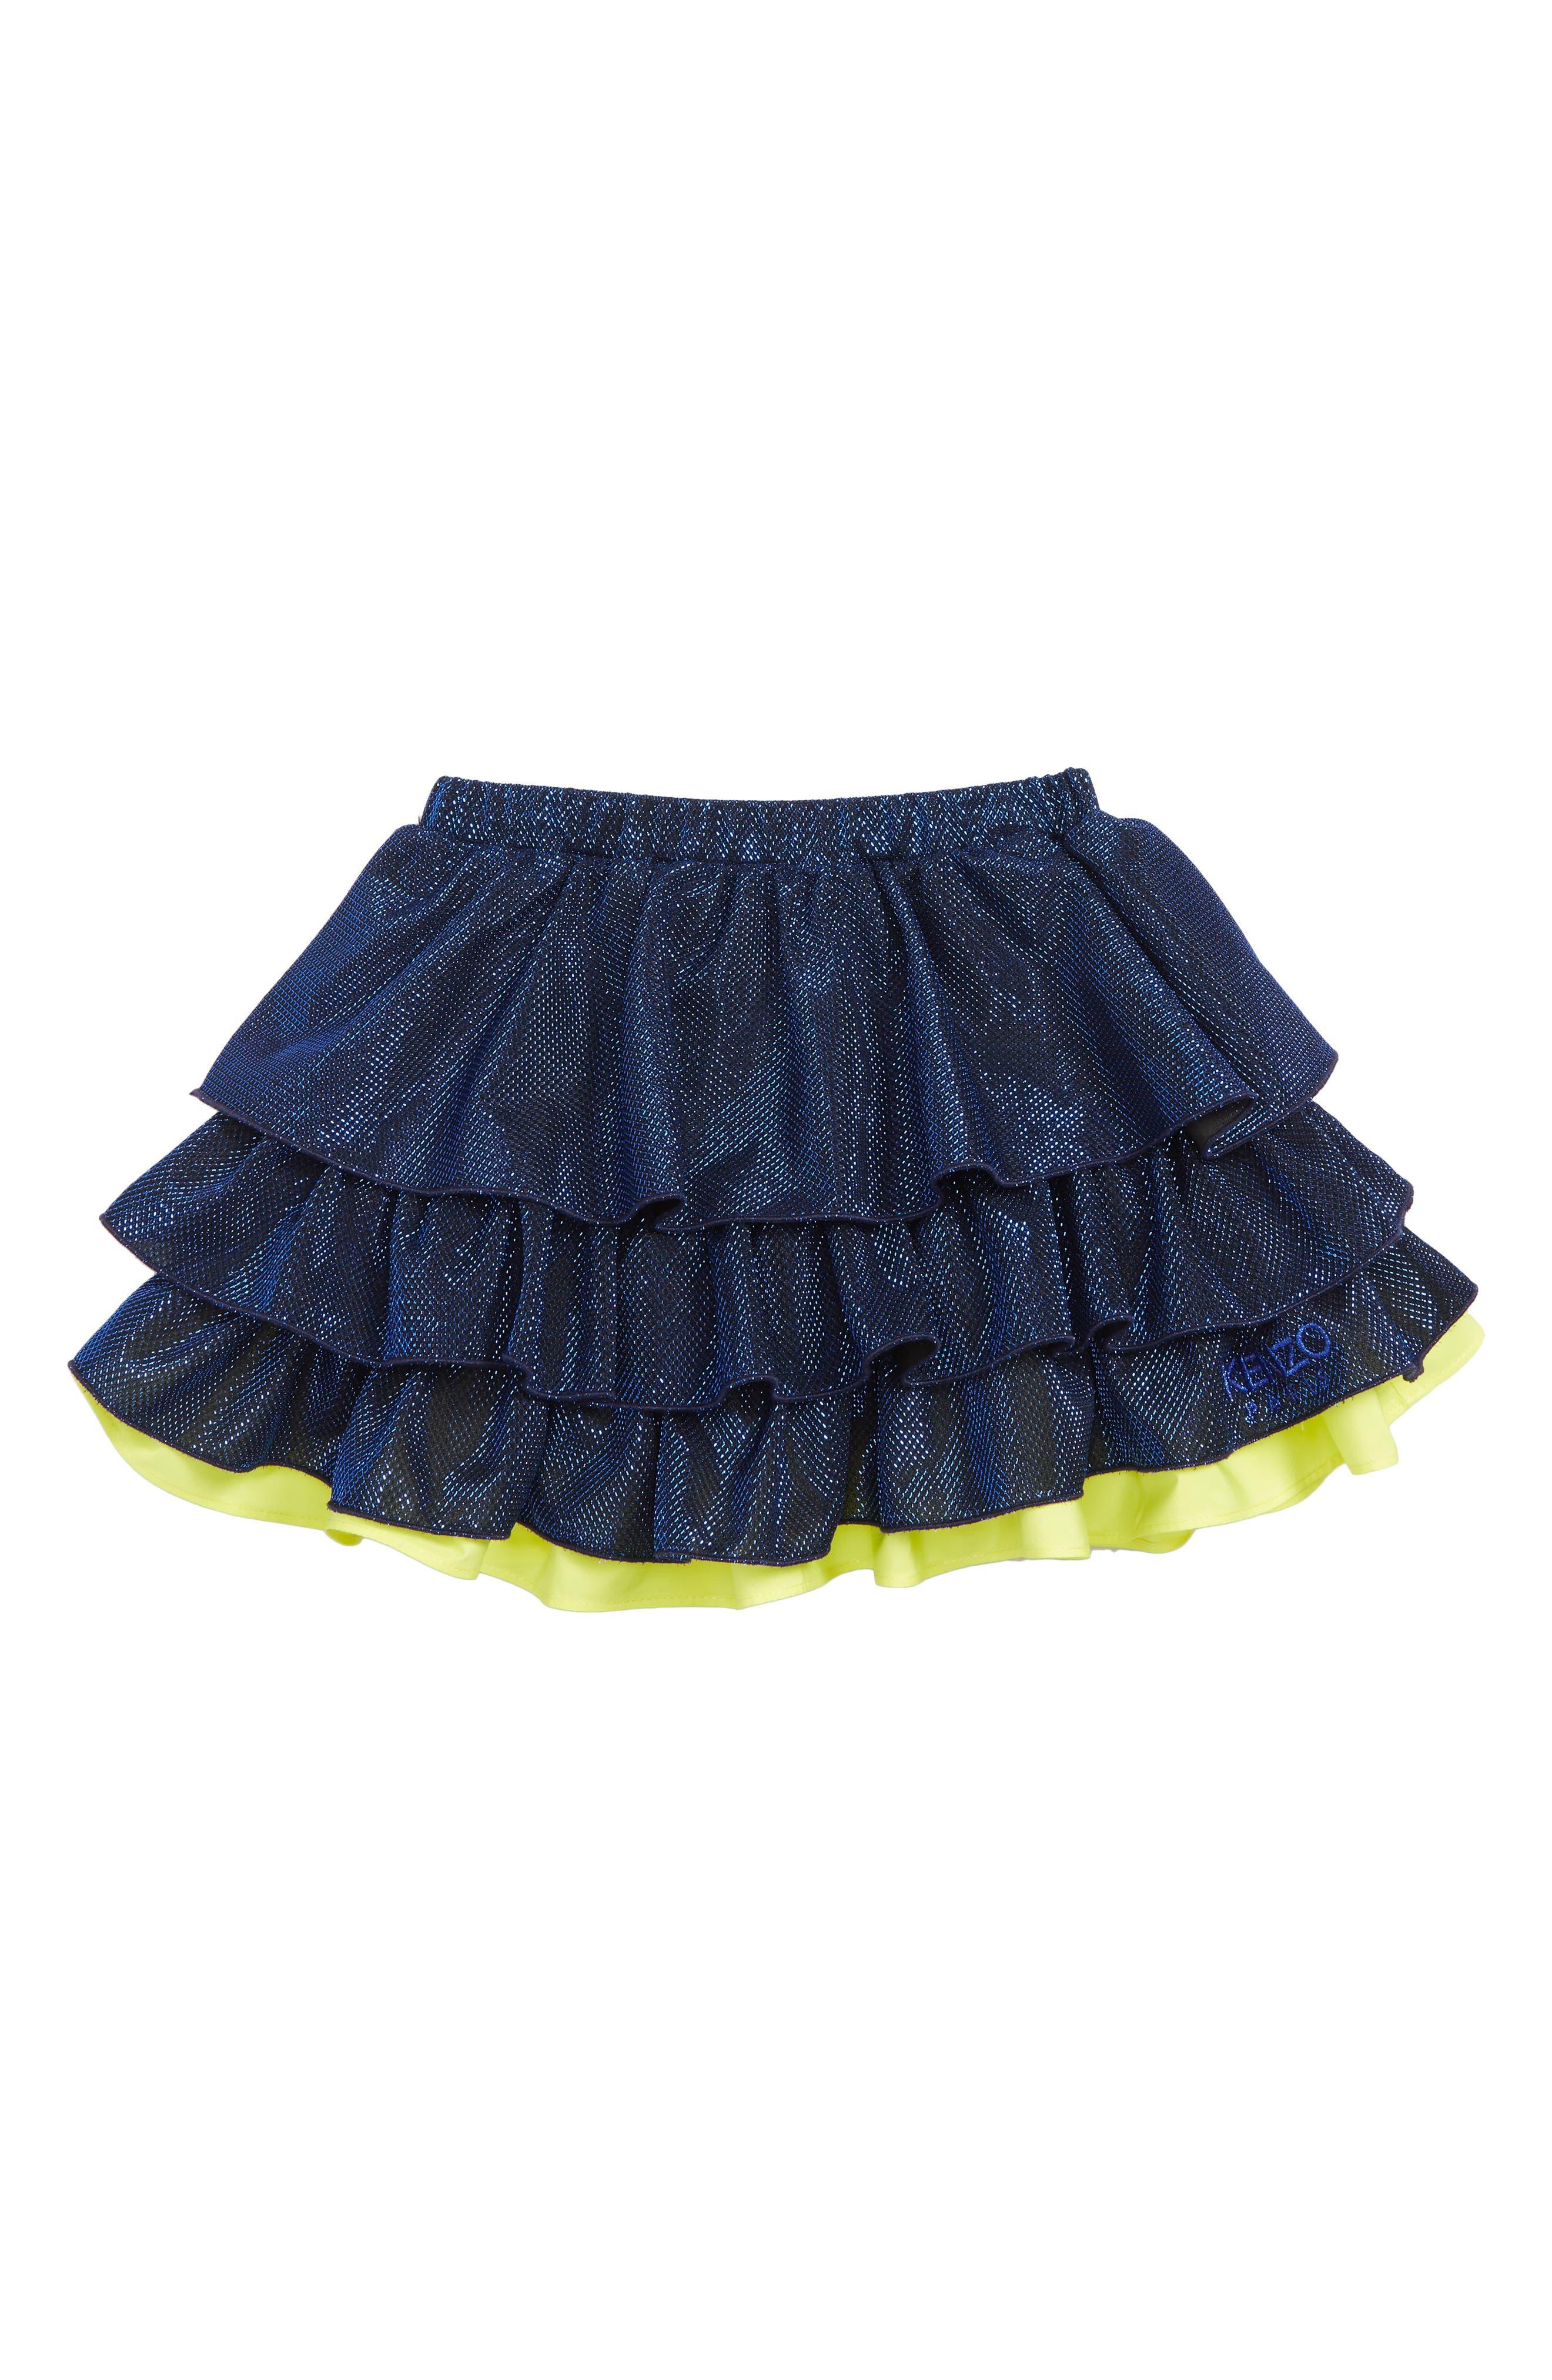 KENZO, Metallic Party Skirt, Main thumbnail 1, color, COBALT